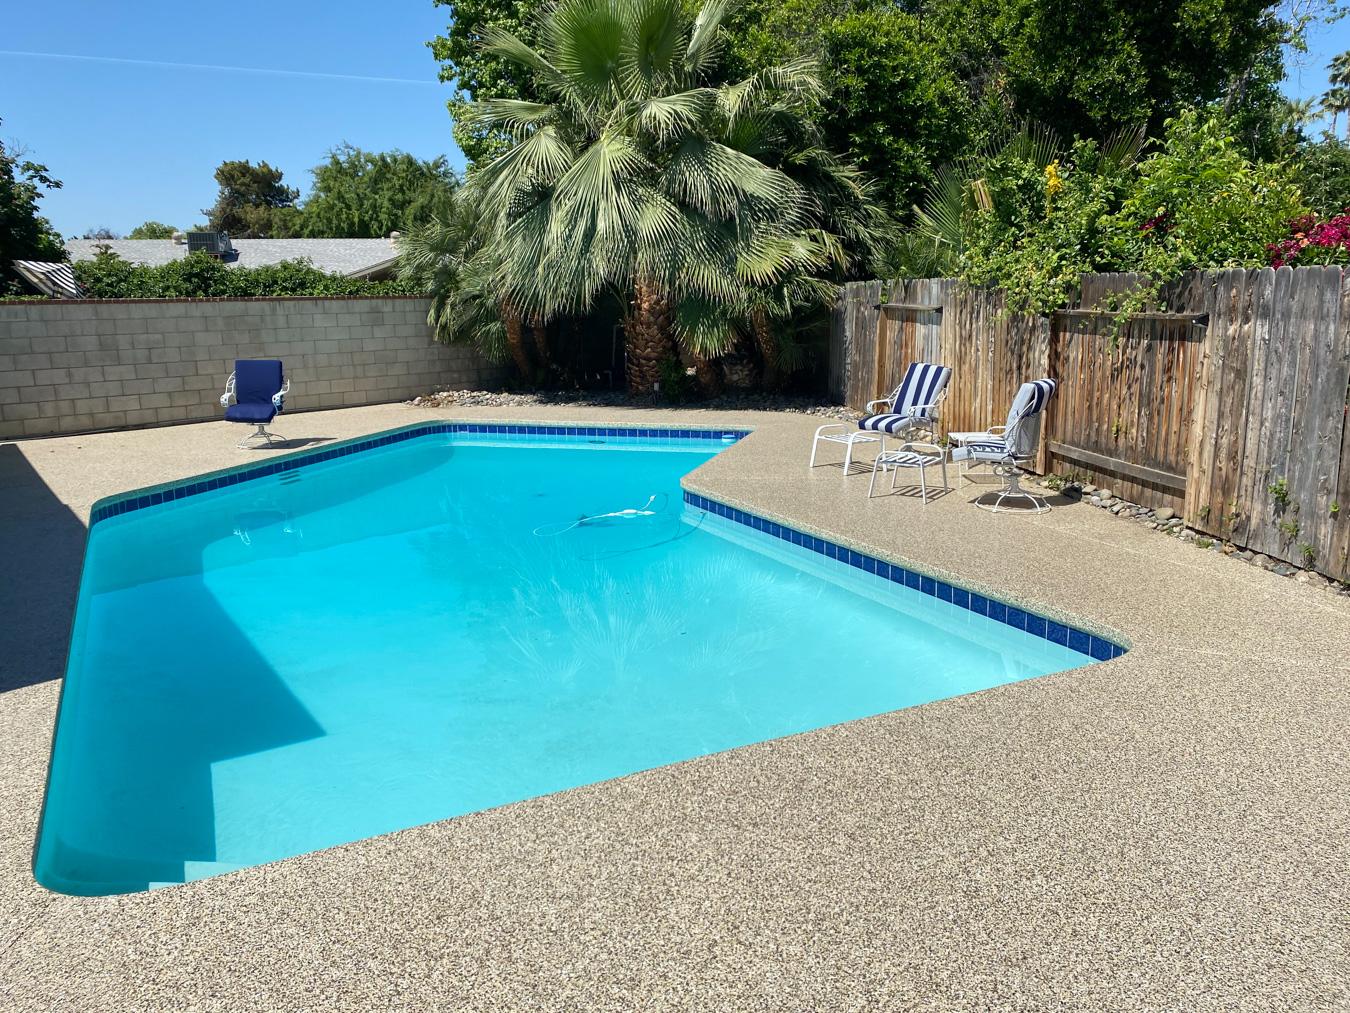 Pool with tan concrete epoxy coating